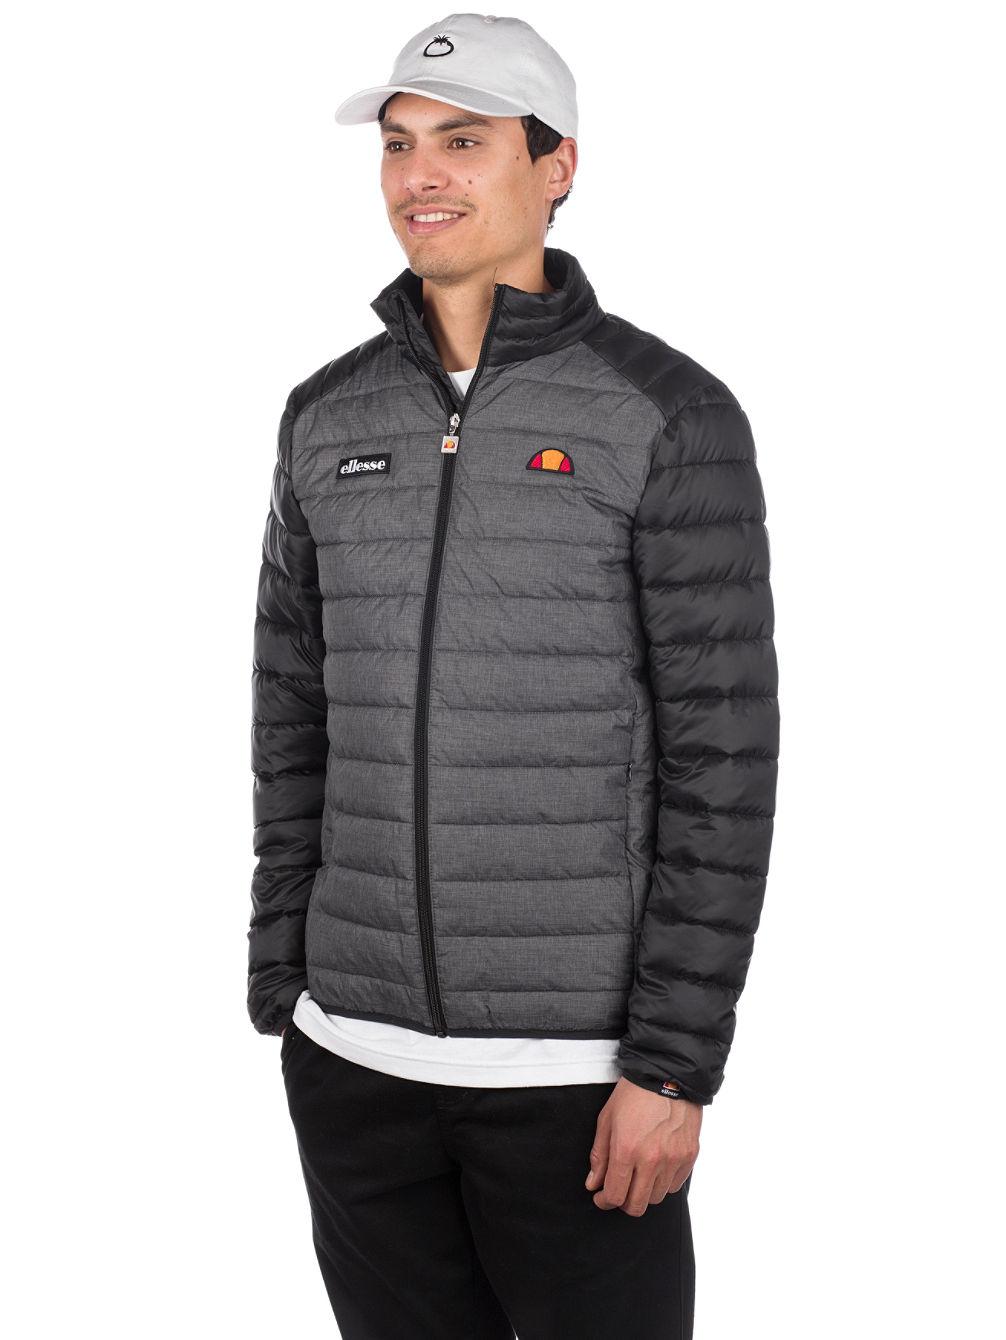 neue niedrigere Preise klare Textur elegant im Stil Tartaro Padded Jacke